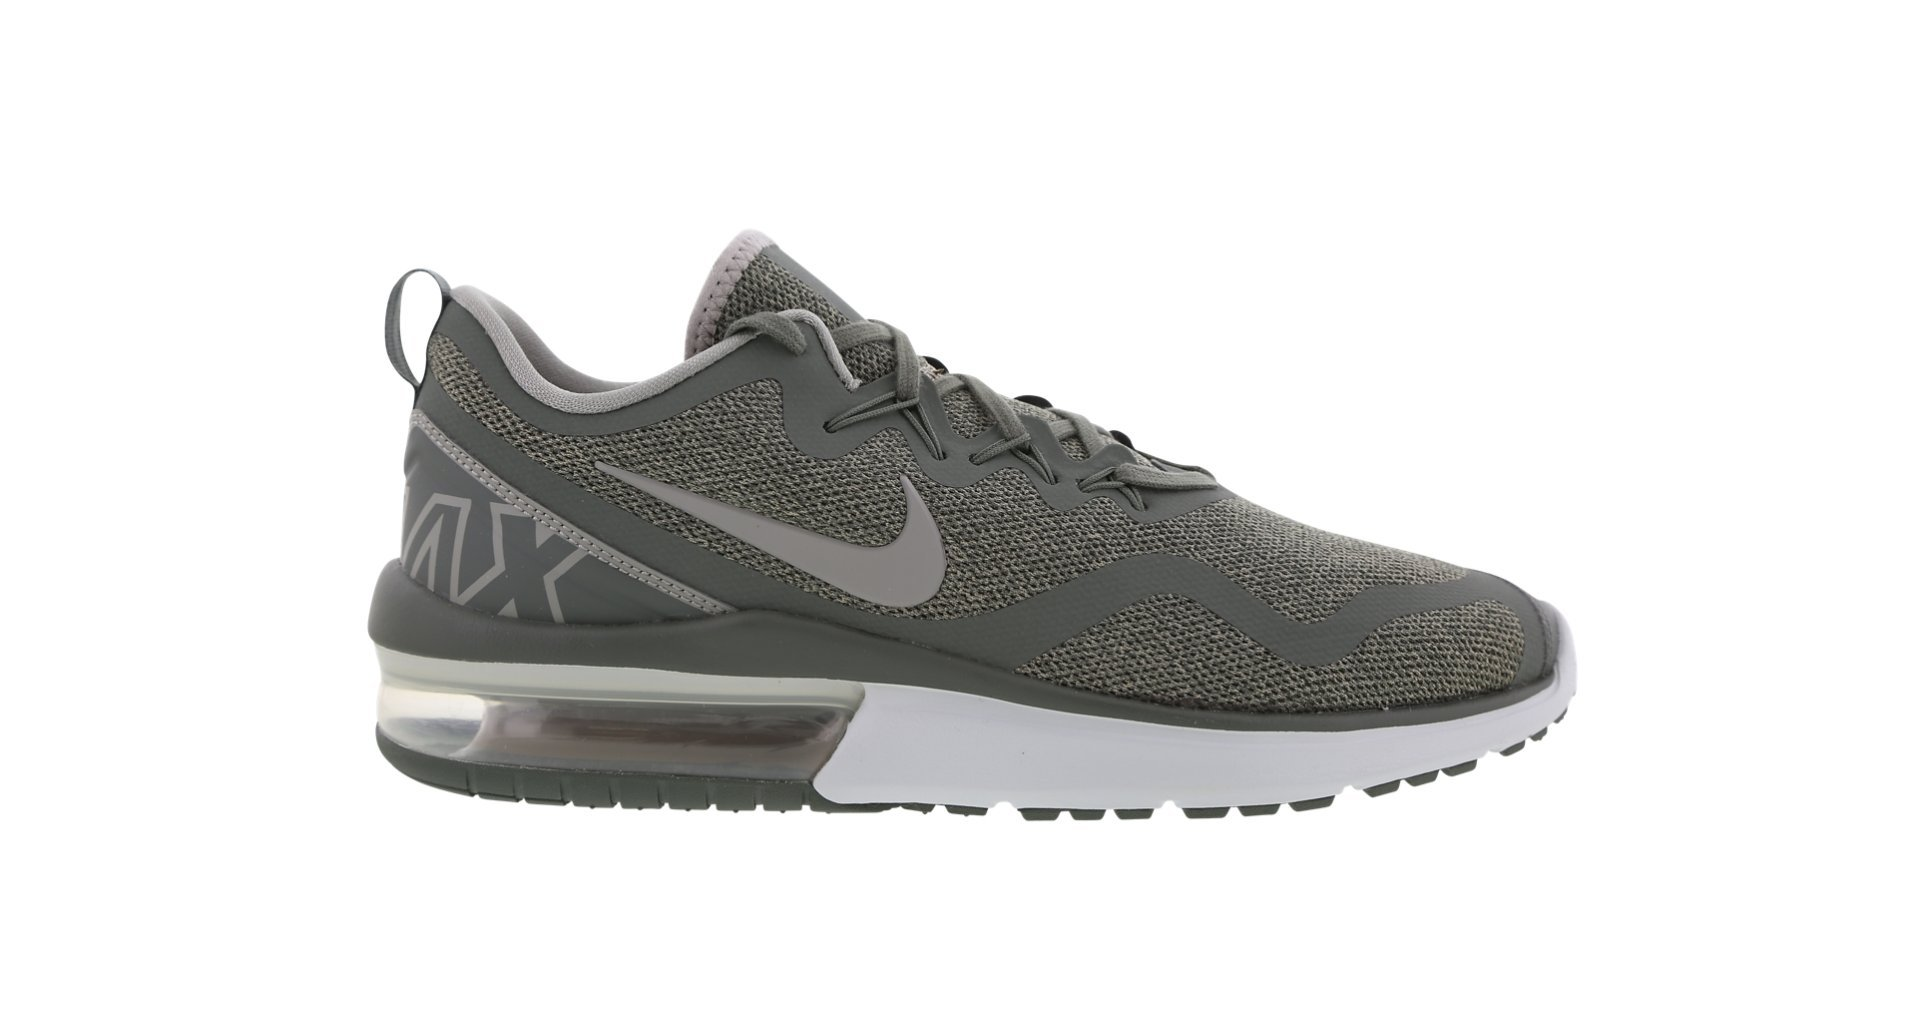 e065779f21e Galleon - NIKE Air Max Fury Mens Running Trainers Aa5739 Sneakers Shoes (UK  9.5 US 10.5 EU 44.5